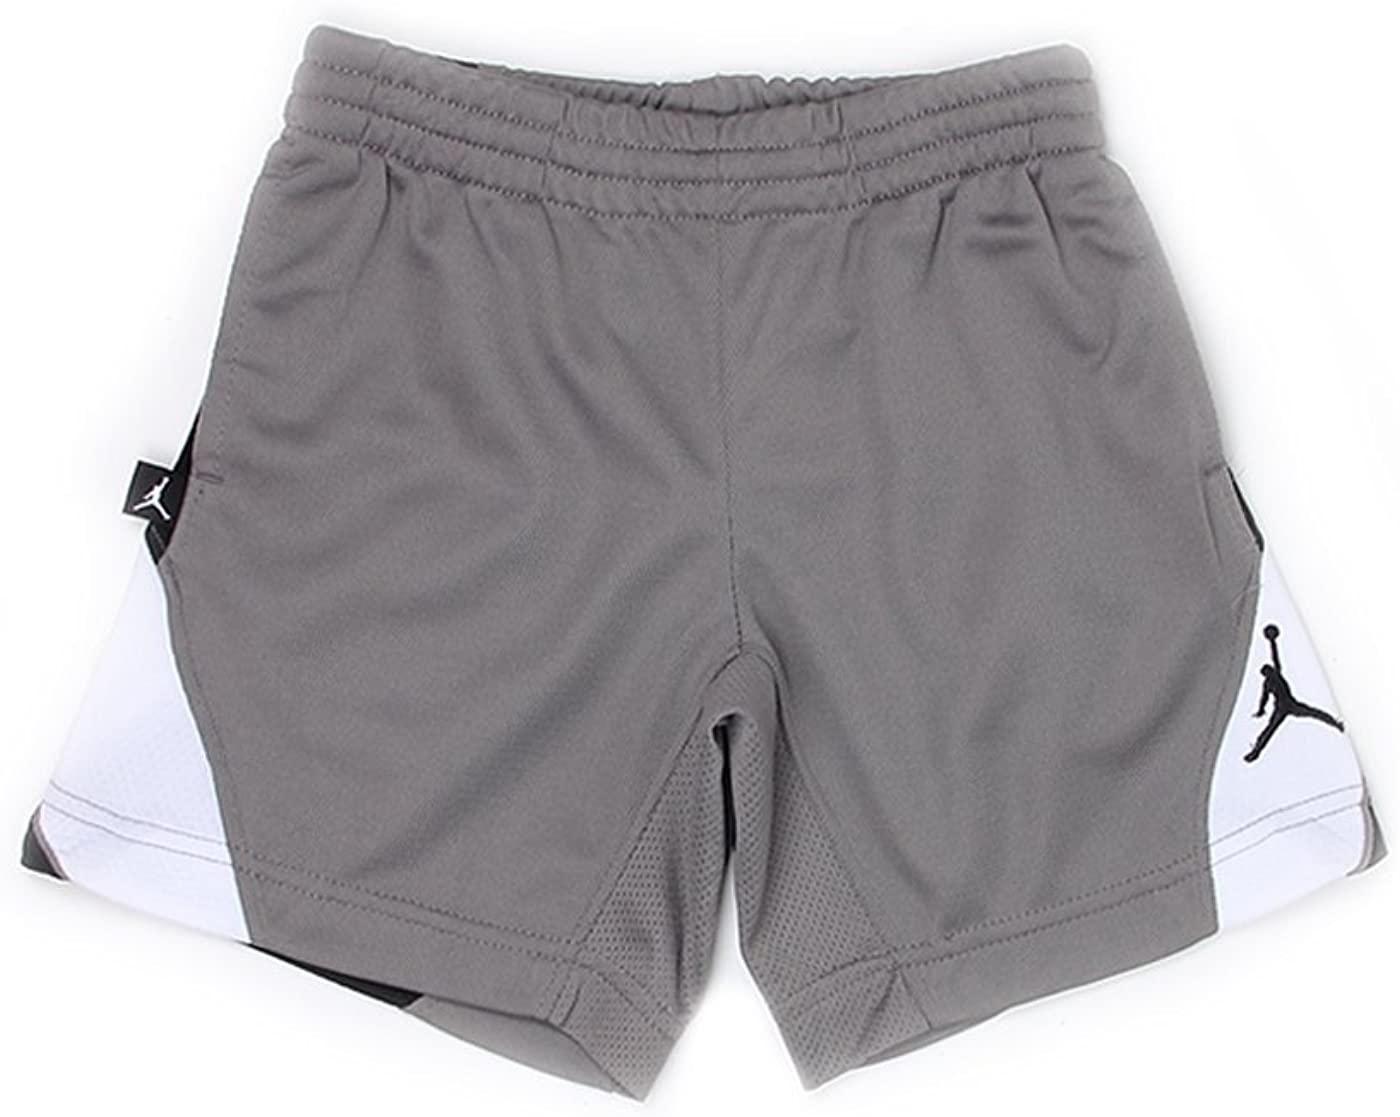 Nike Air Jordan Jumpman Boys Basketball Shorts, Flat Pewter, Large, 950922 292